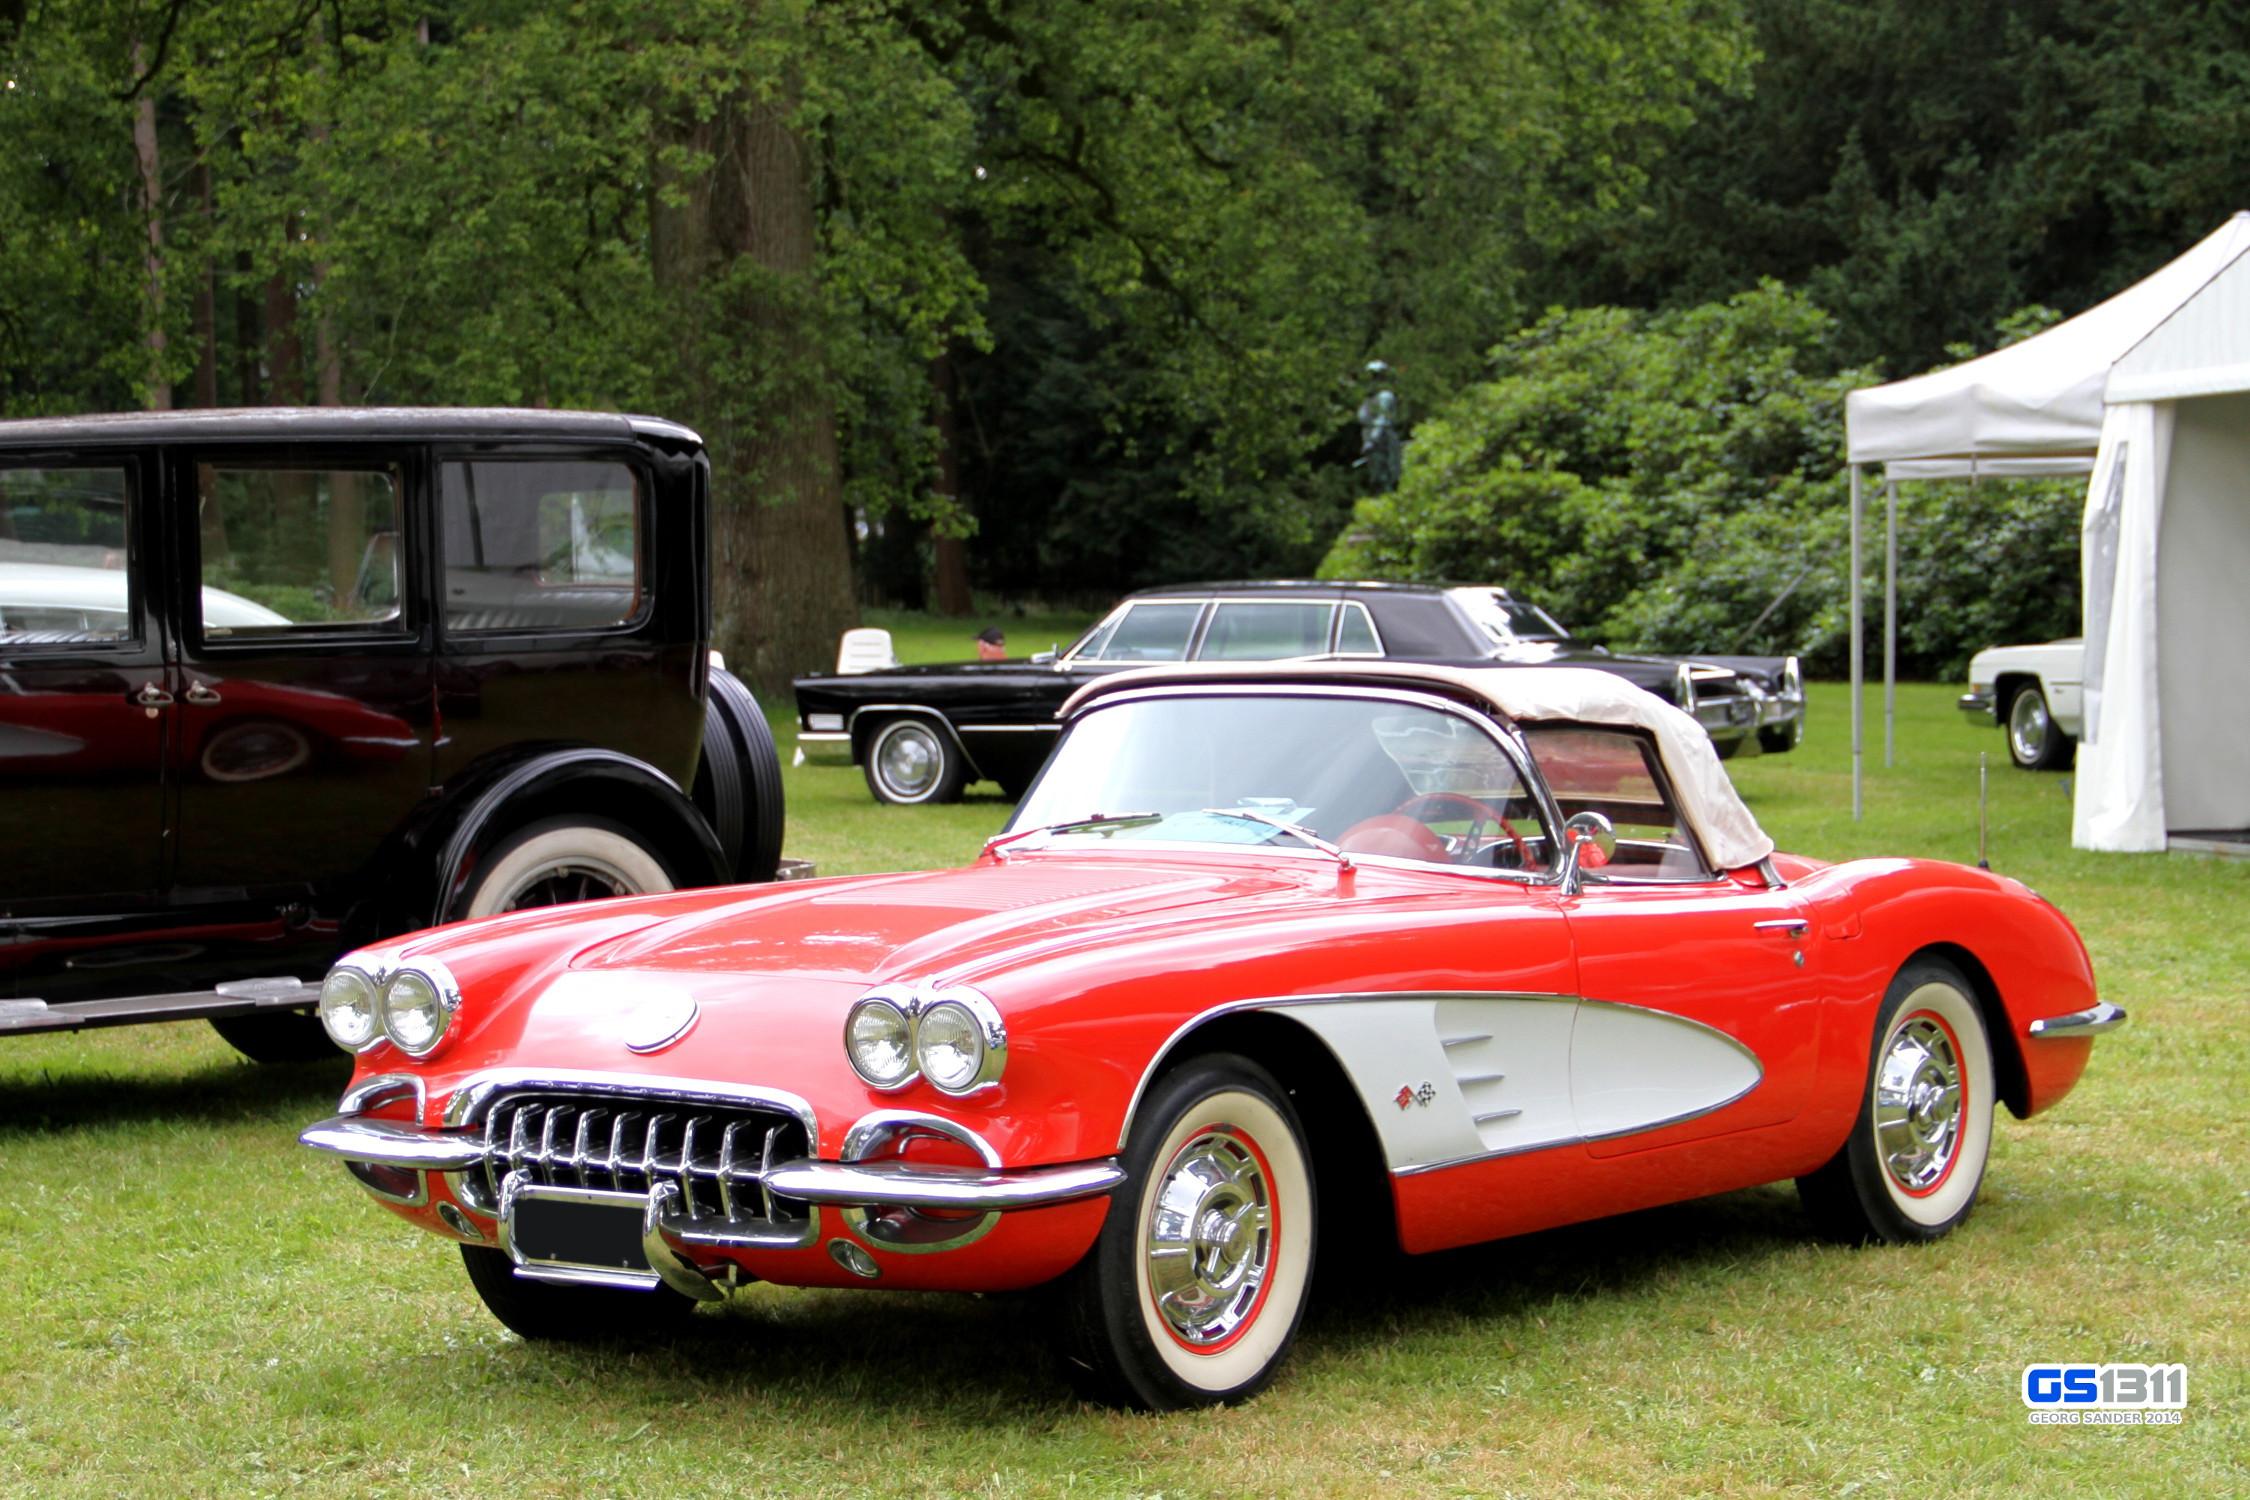 Wallpaper : old, red, sports car, Vintage car, Corvette, Chevrolet ...